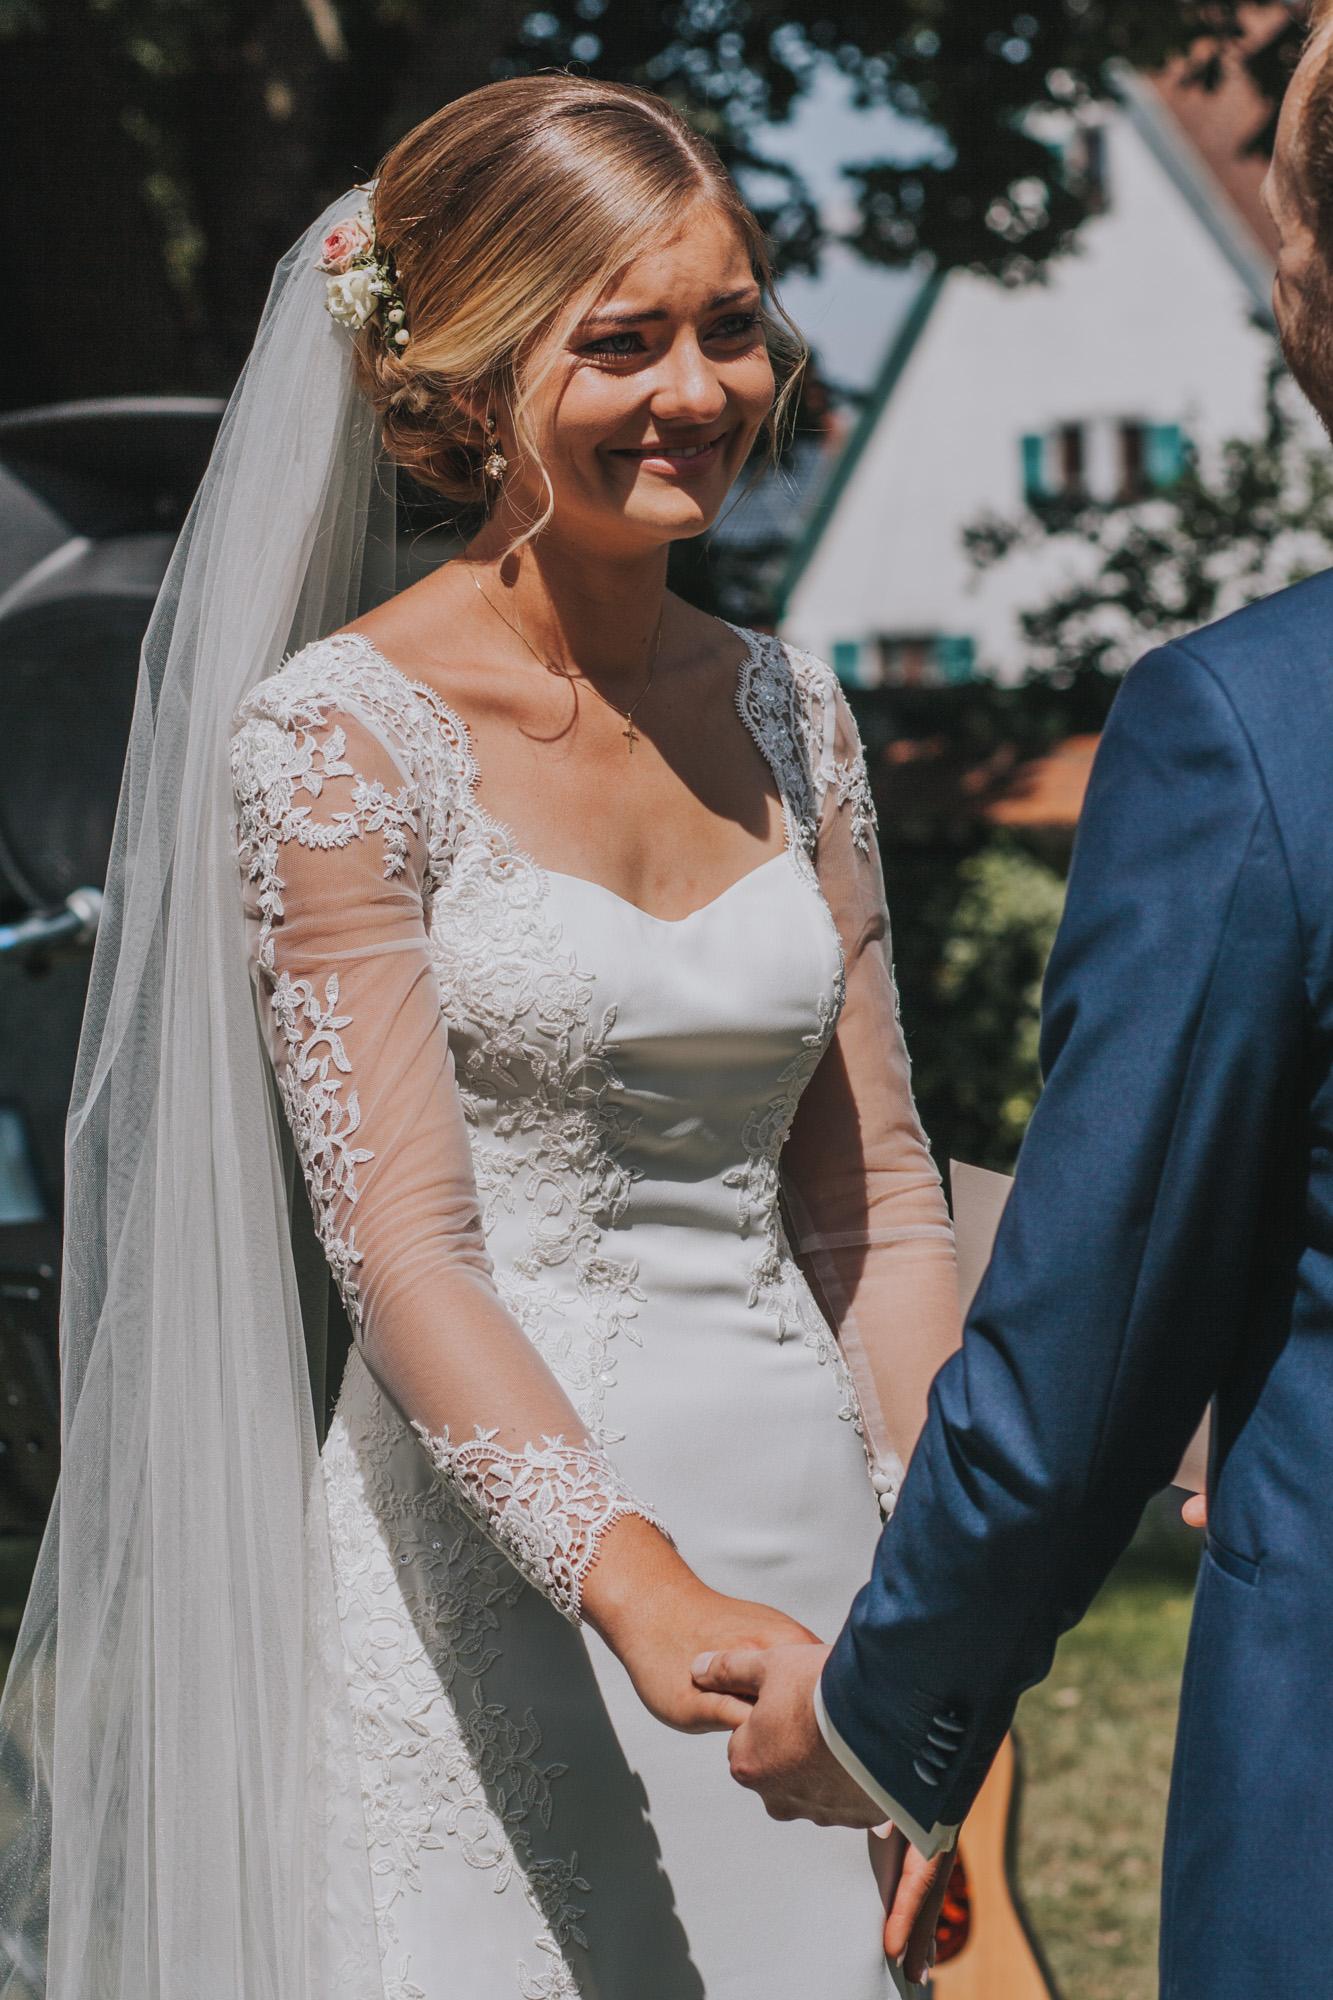 Hochzeit - Memory factory - 20180616-0029.jpg